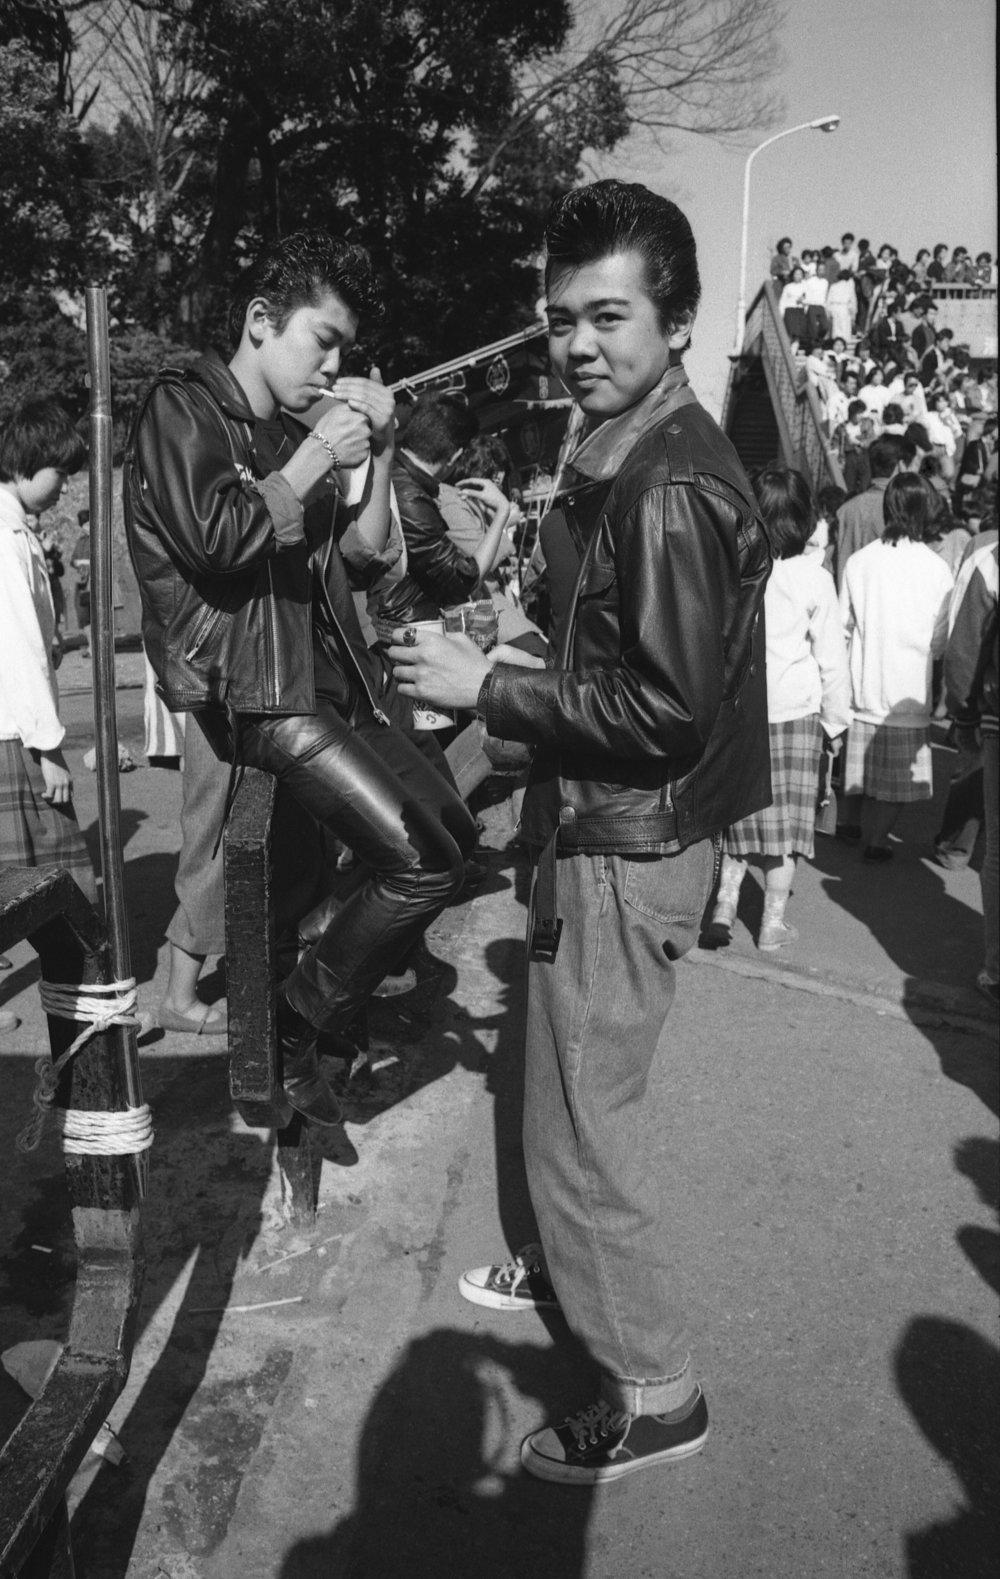 Rokabiri-zoku, Harajuku, Tokyo. April, 1980. (1/3)